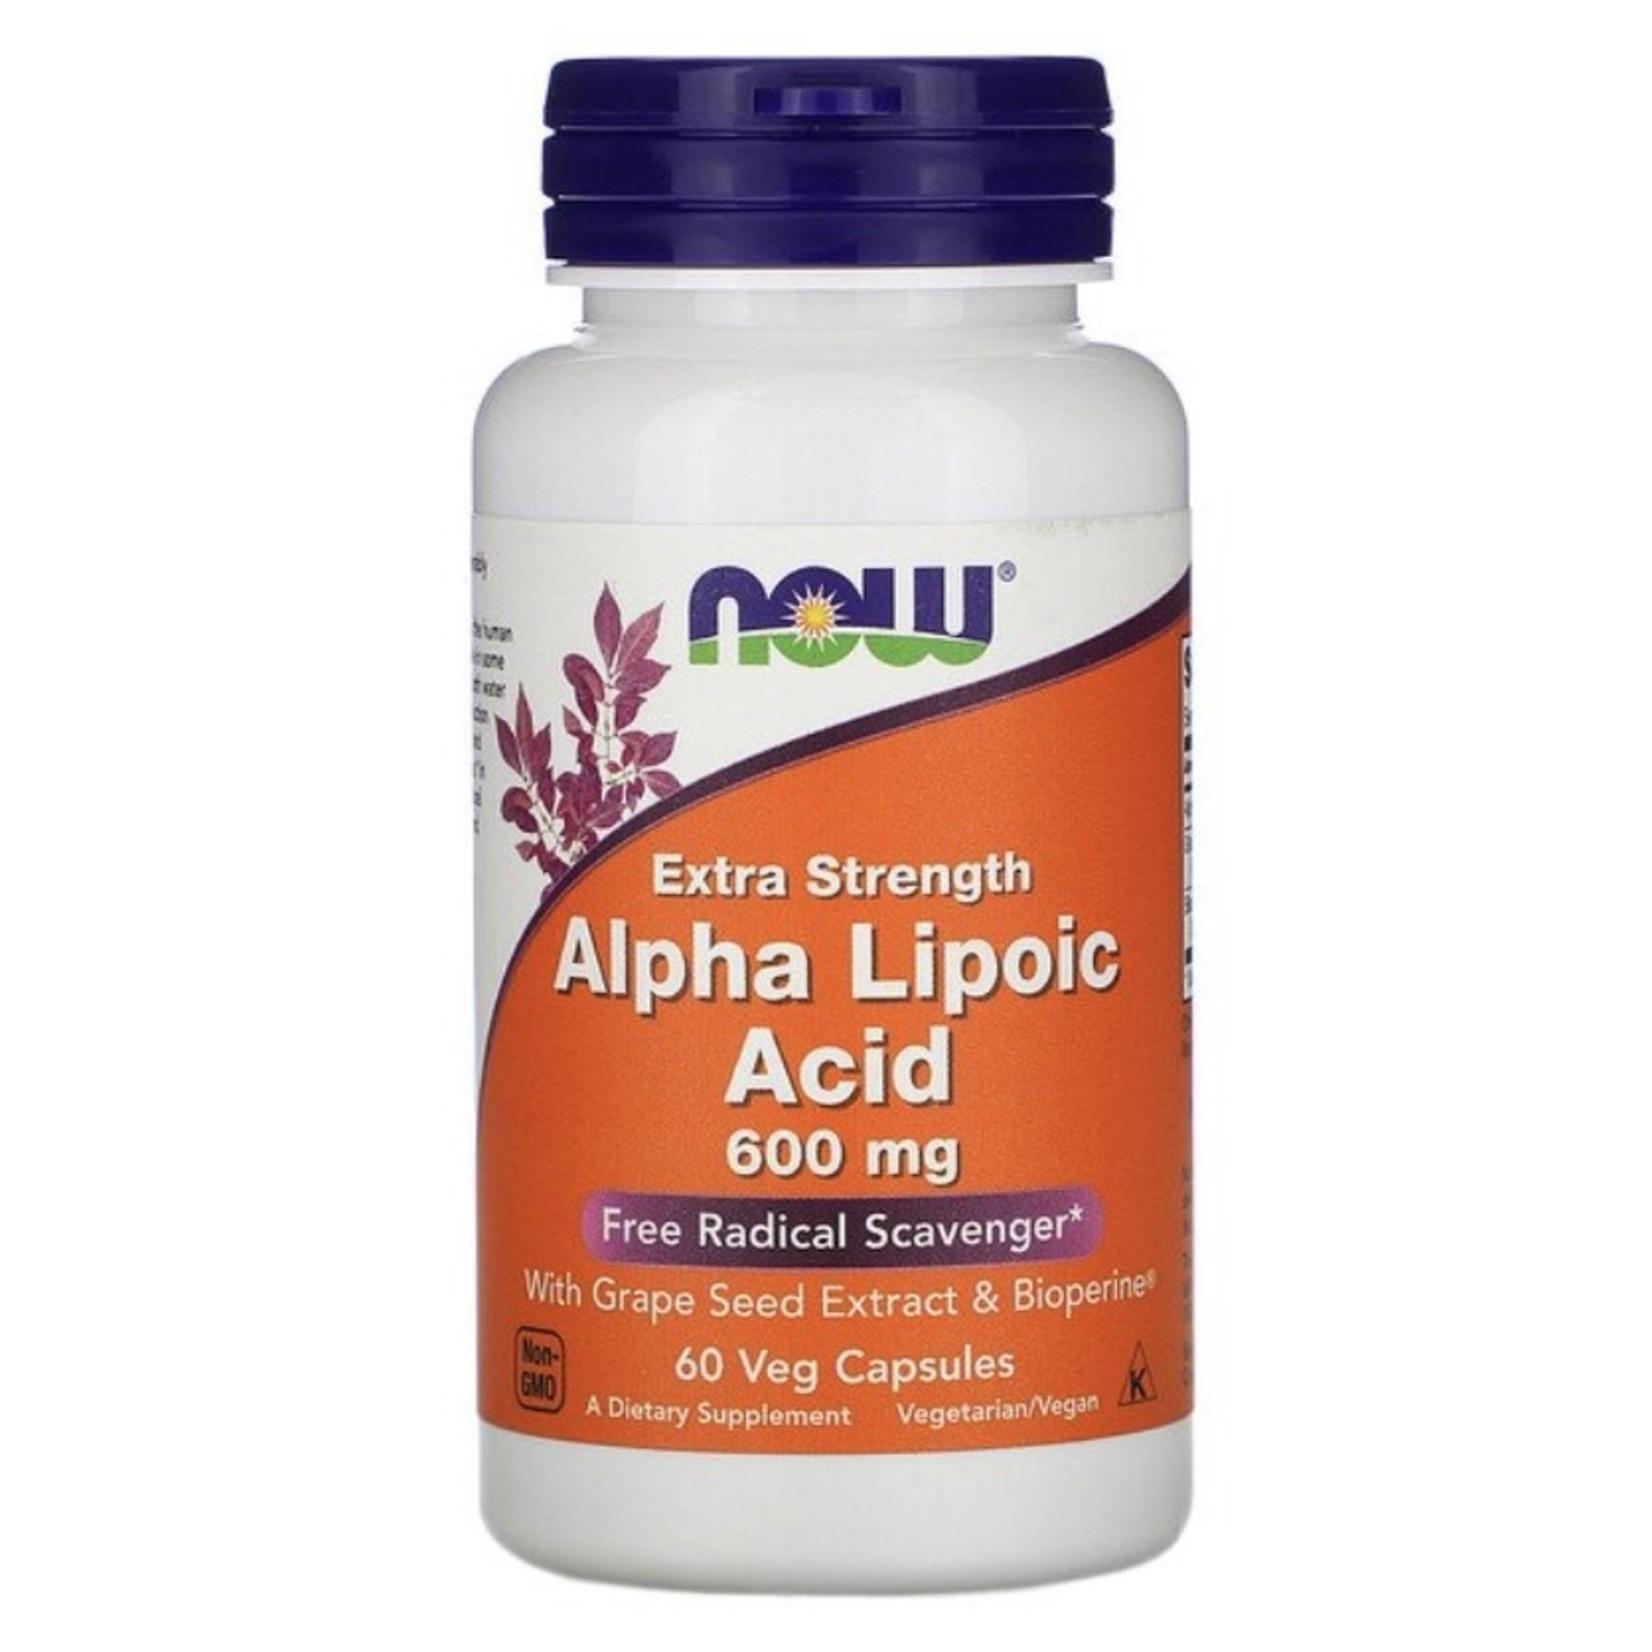 Now Now Alpha Lipoic Acid 600mg 60 caps